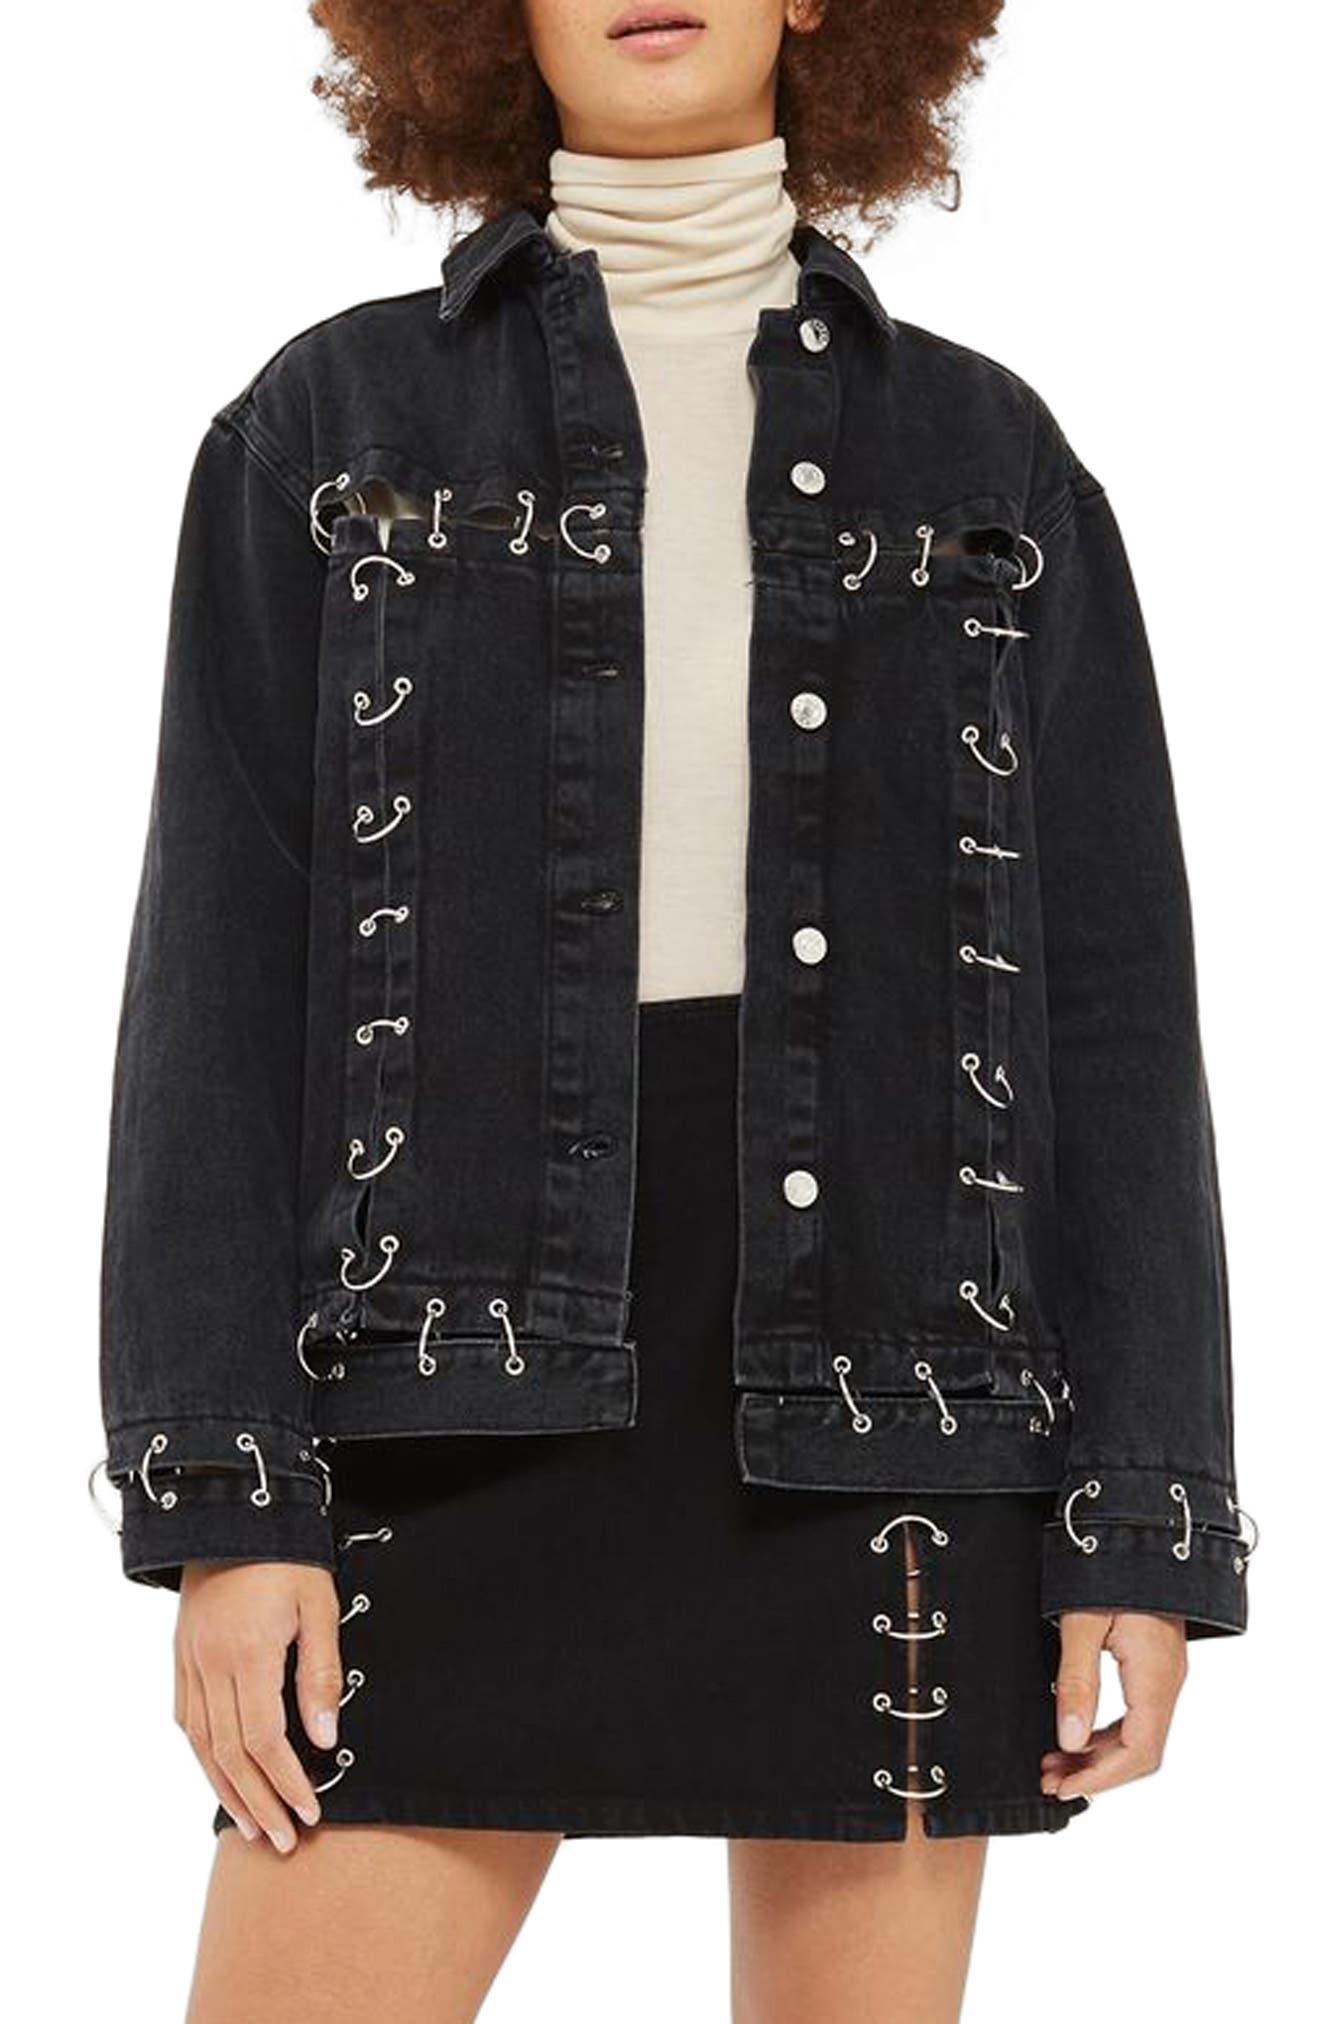 Topshop Piercing Detail Denim Jacket